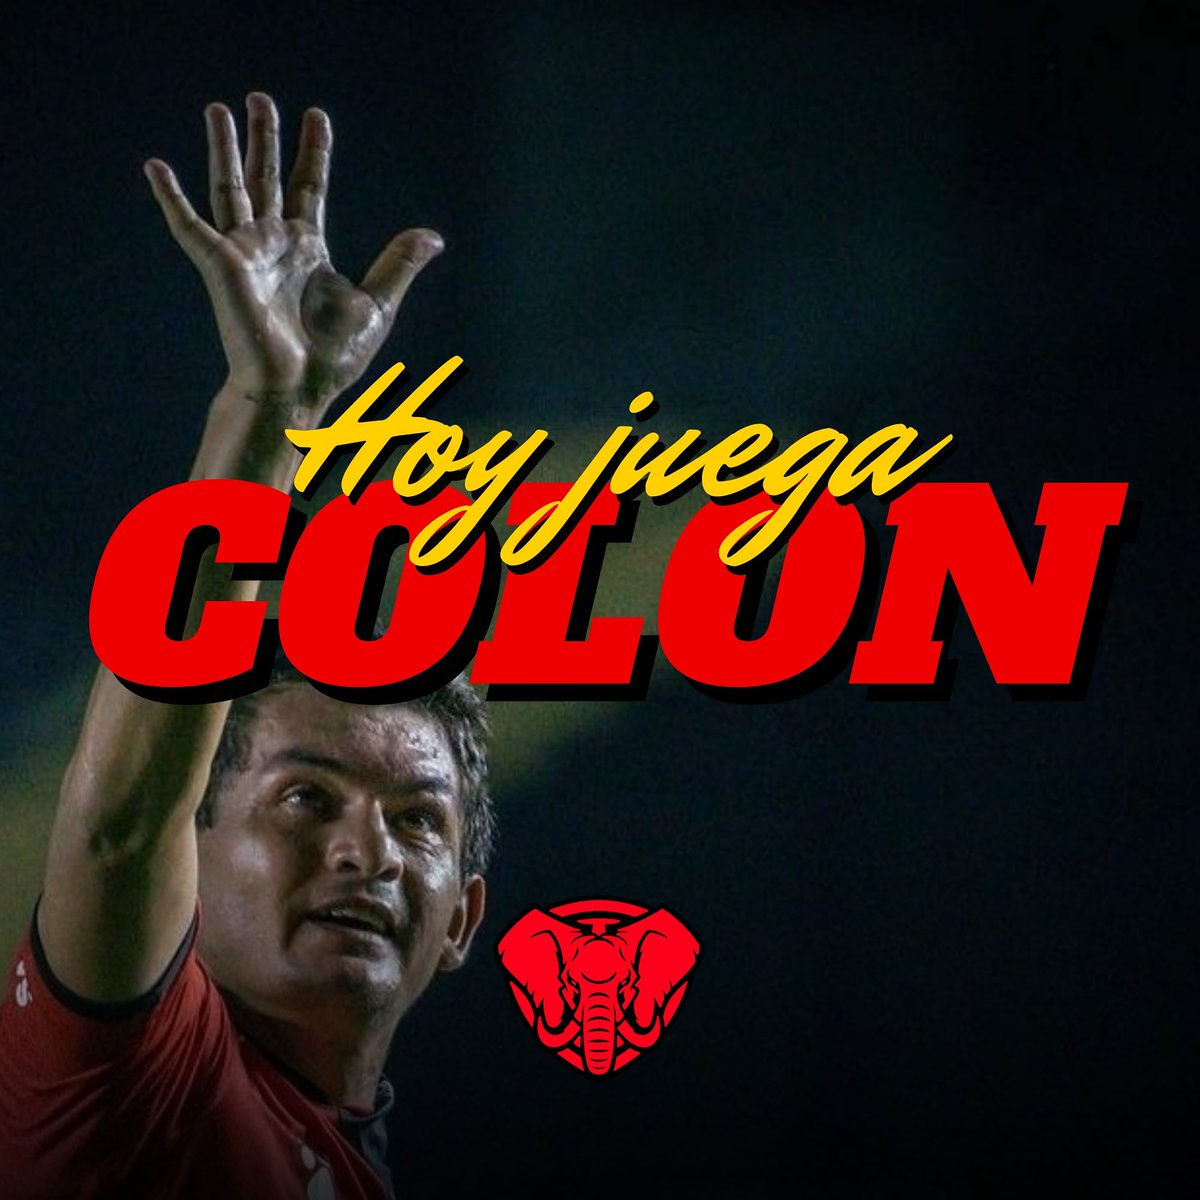 RT @PrimeroColon: ¡HOY JUEGA COLÓN! DALE NEGRO🔴⚫ https://t.co/zzTGM81snk